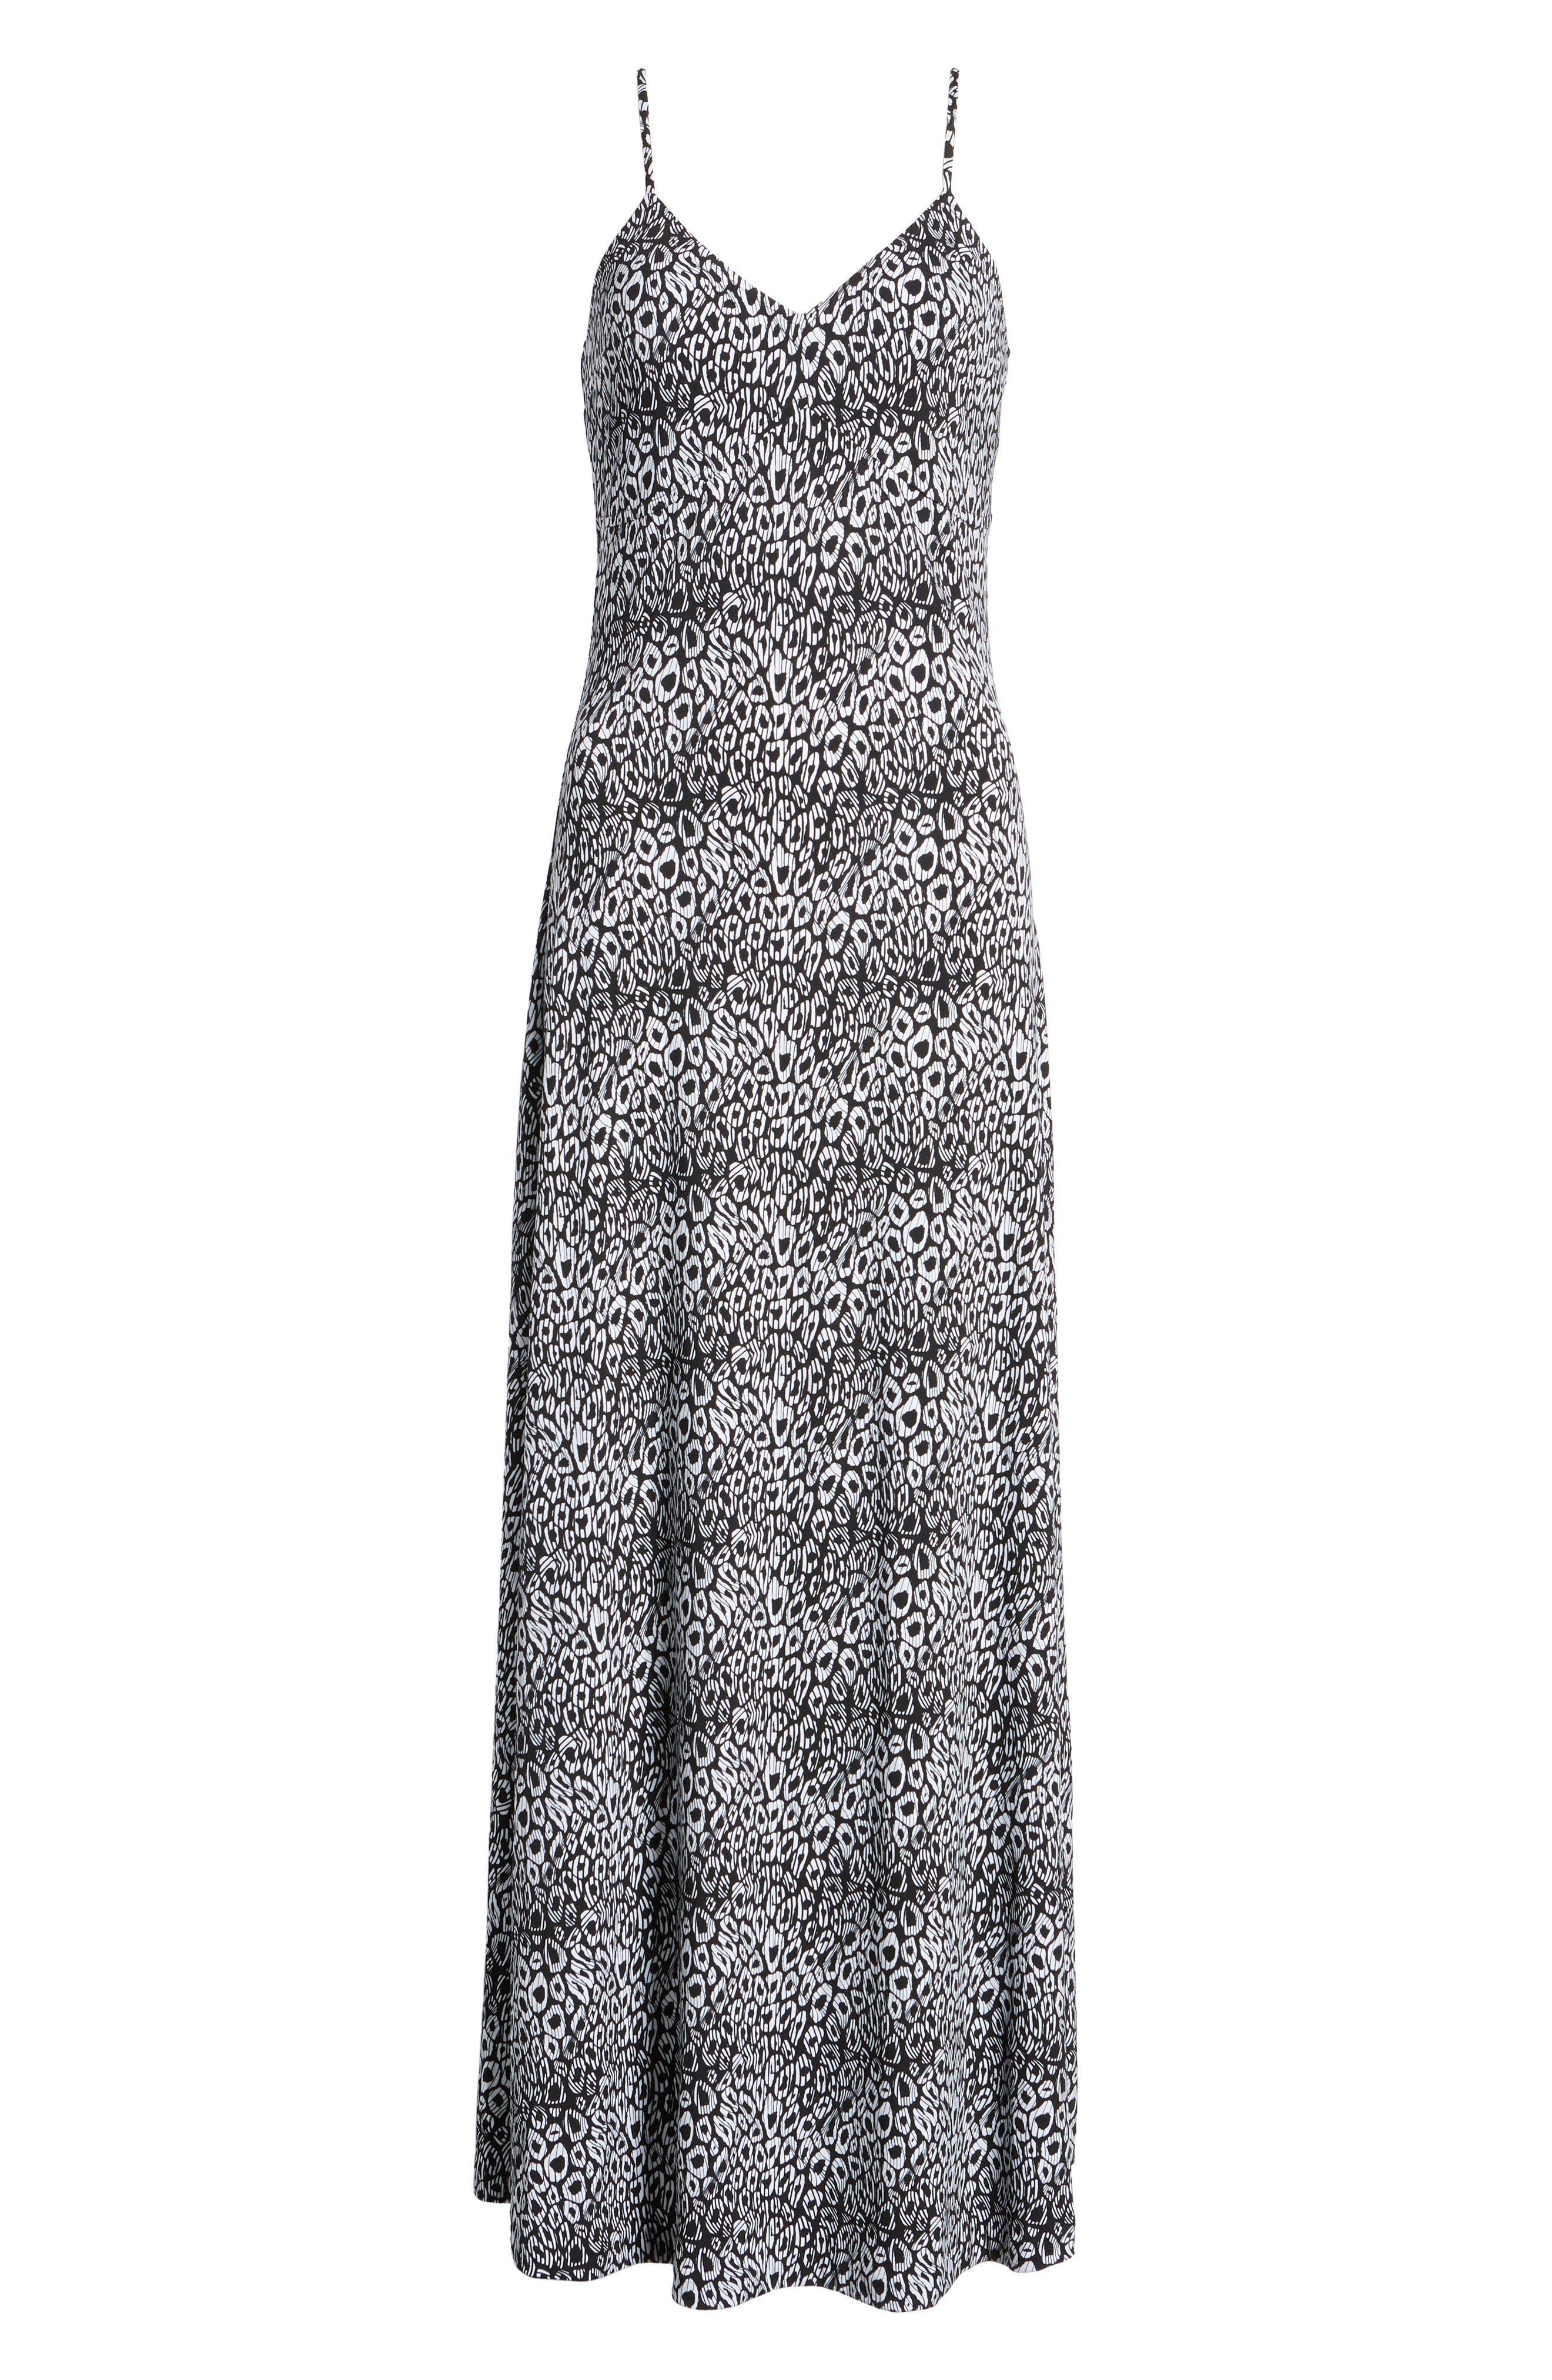 Wavy Leopard Print Tank Maxi Dress,                             Alternate thumbnail 7, color,                             Black/ White